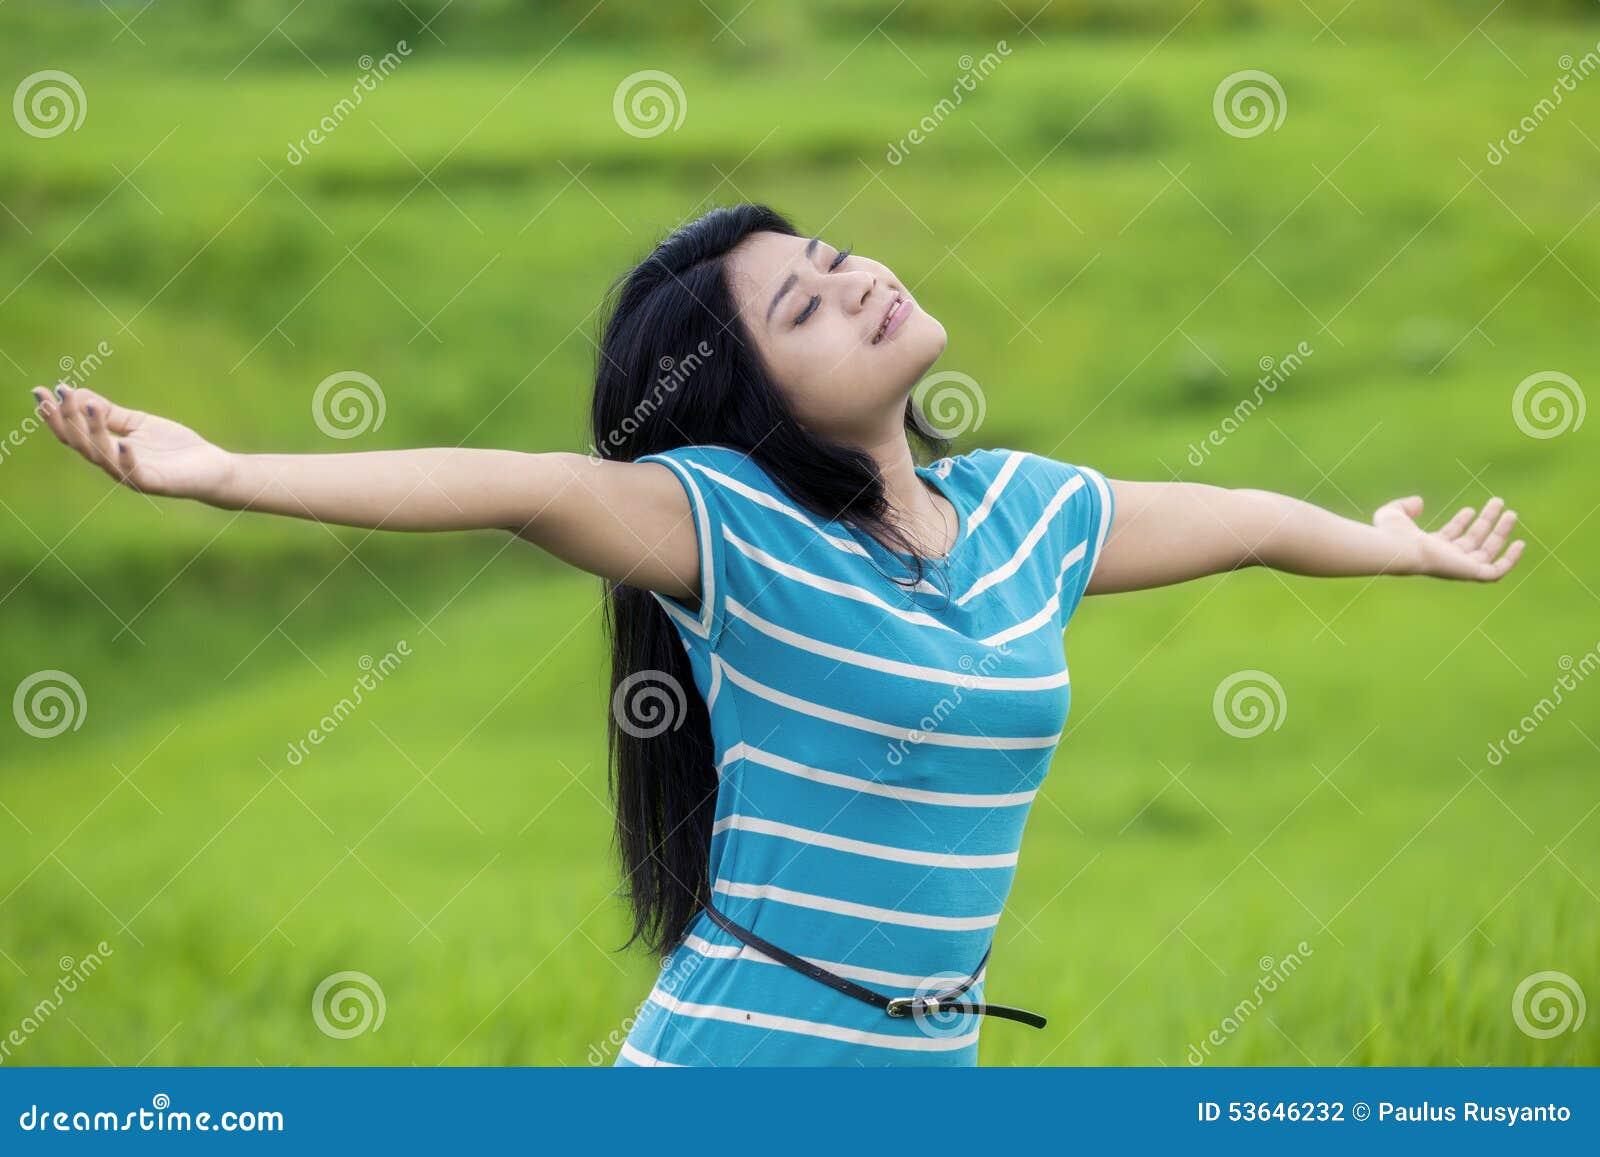 Hübsche Frau atmen Frischluft am Feld